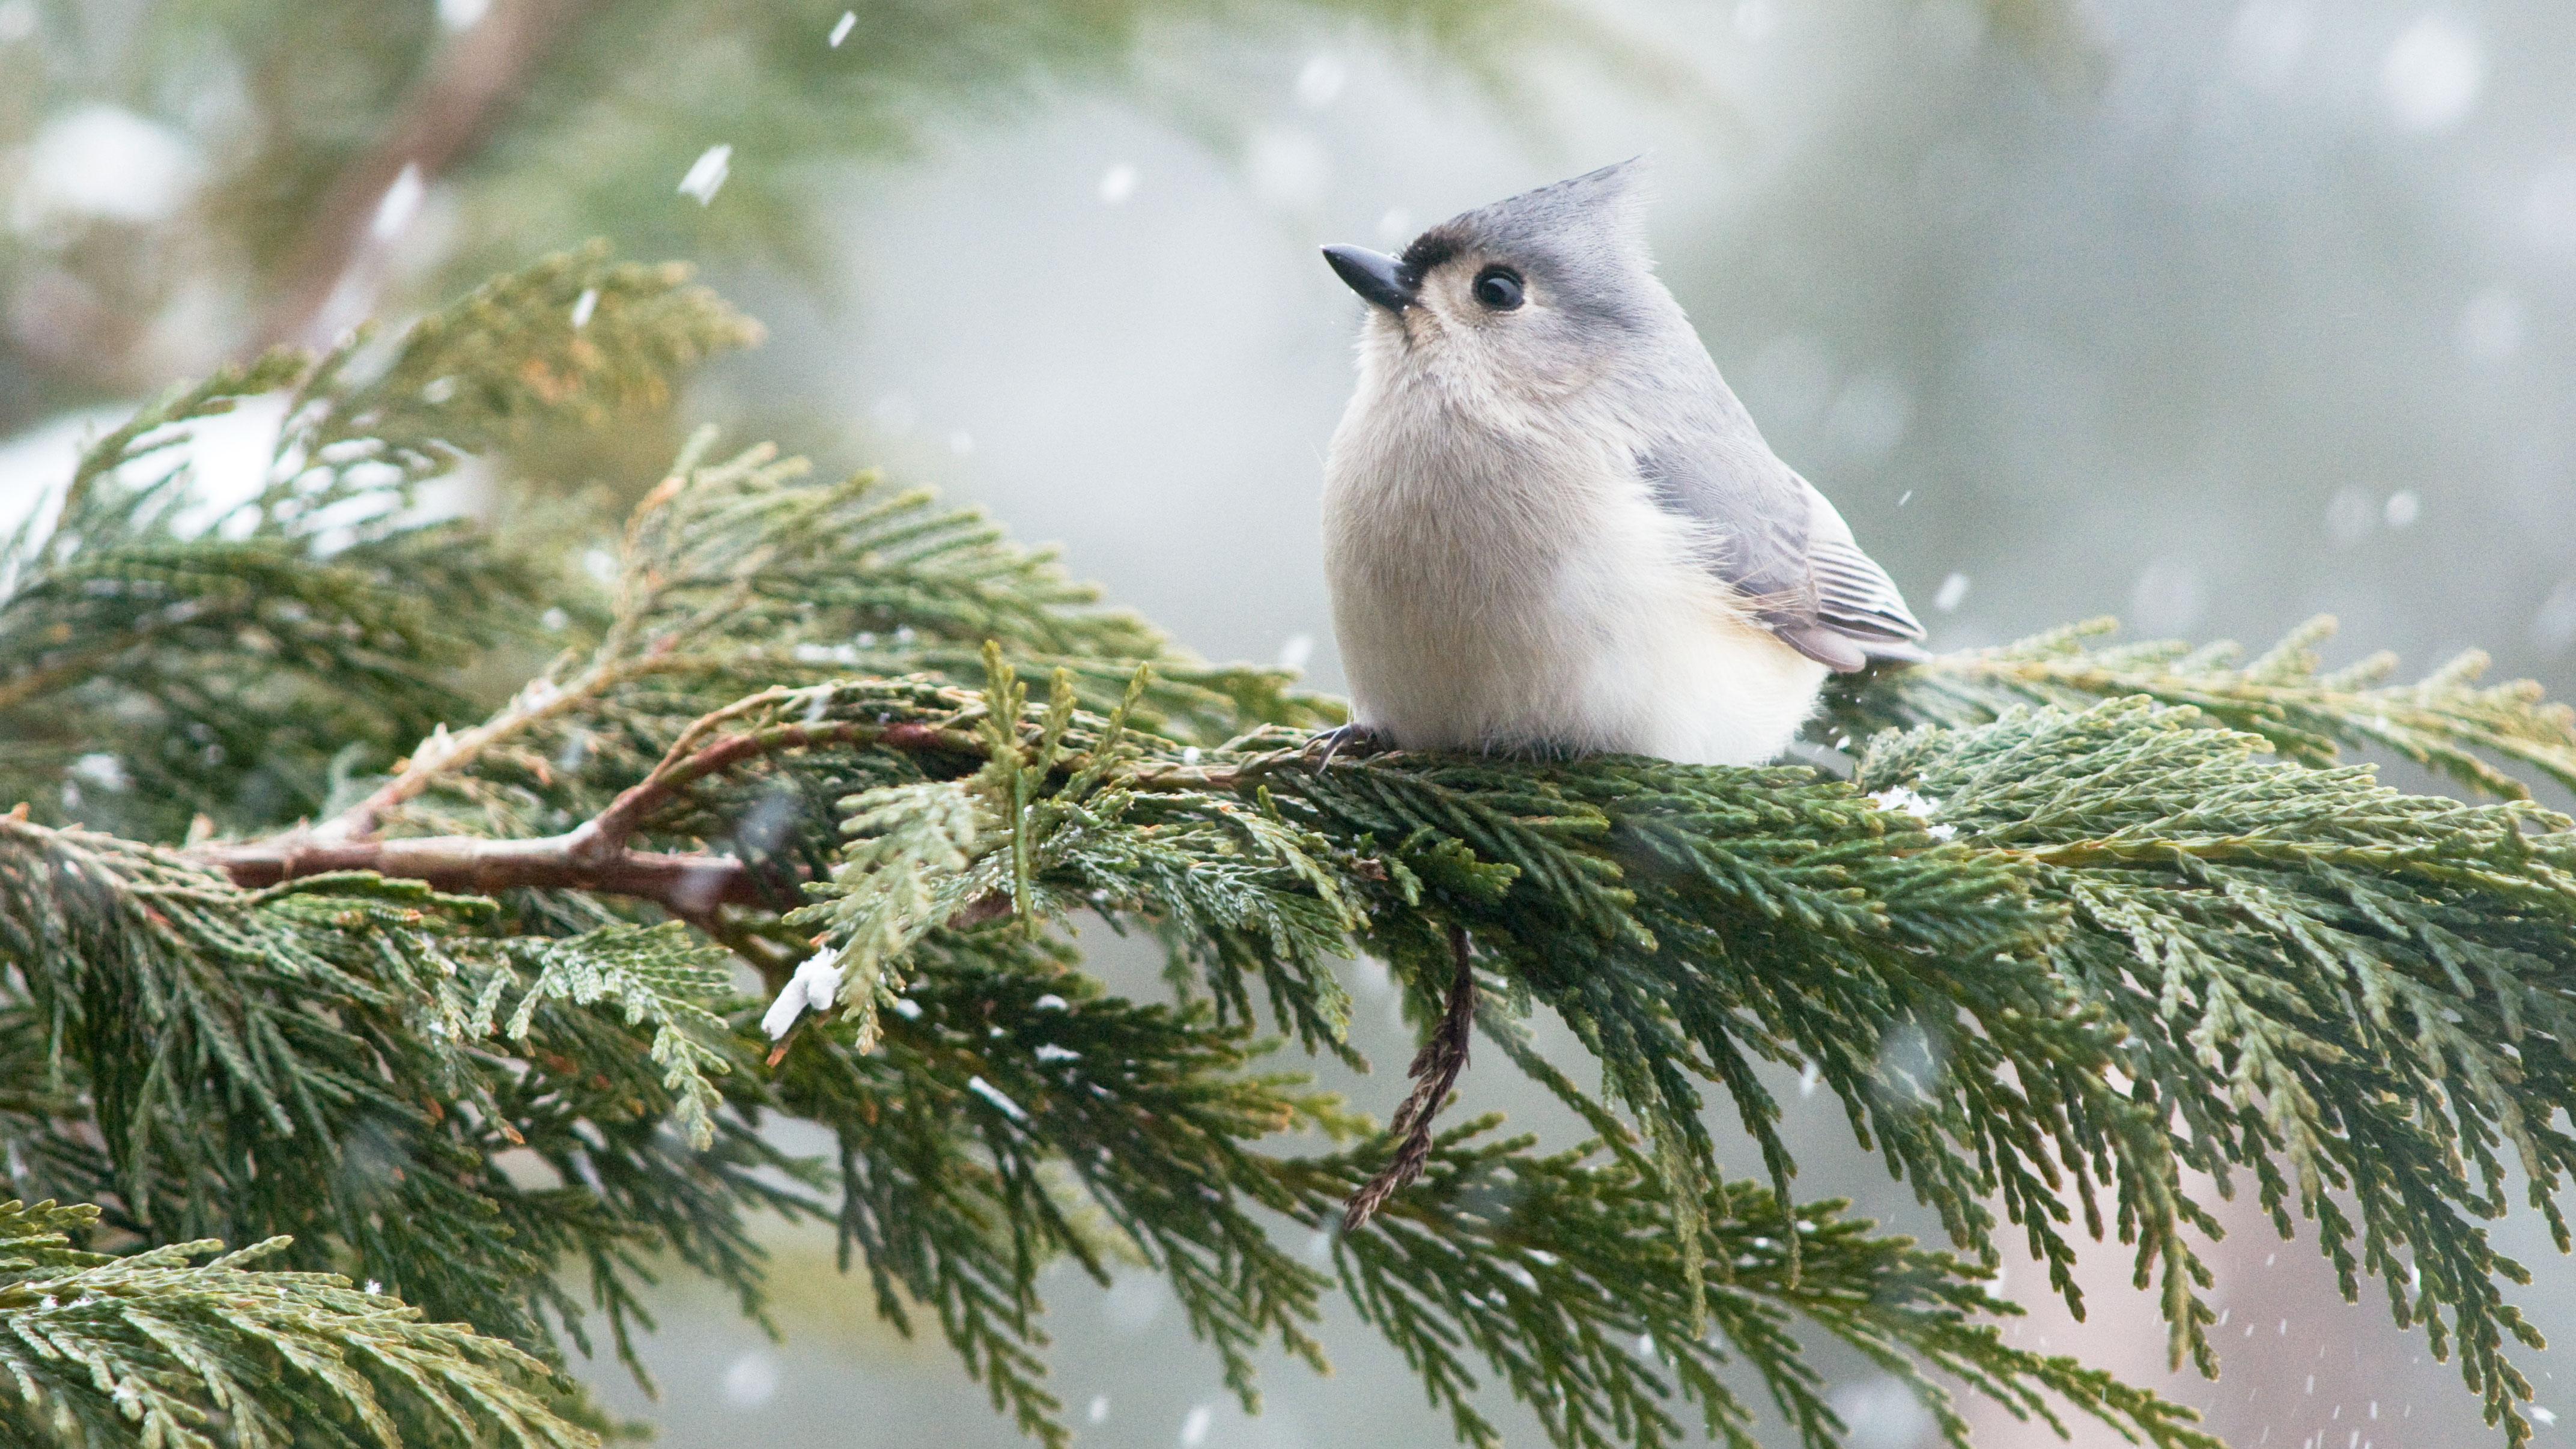 Tufted Titmouse. Michele Black/Great Backyard Bird Count